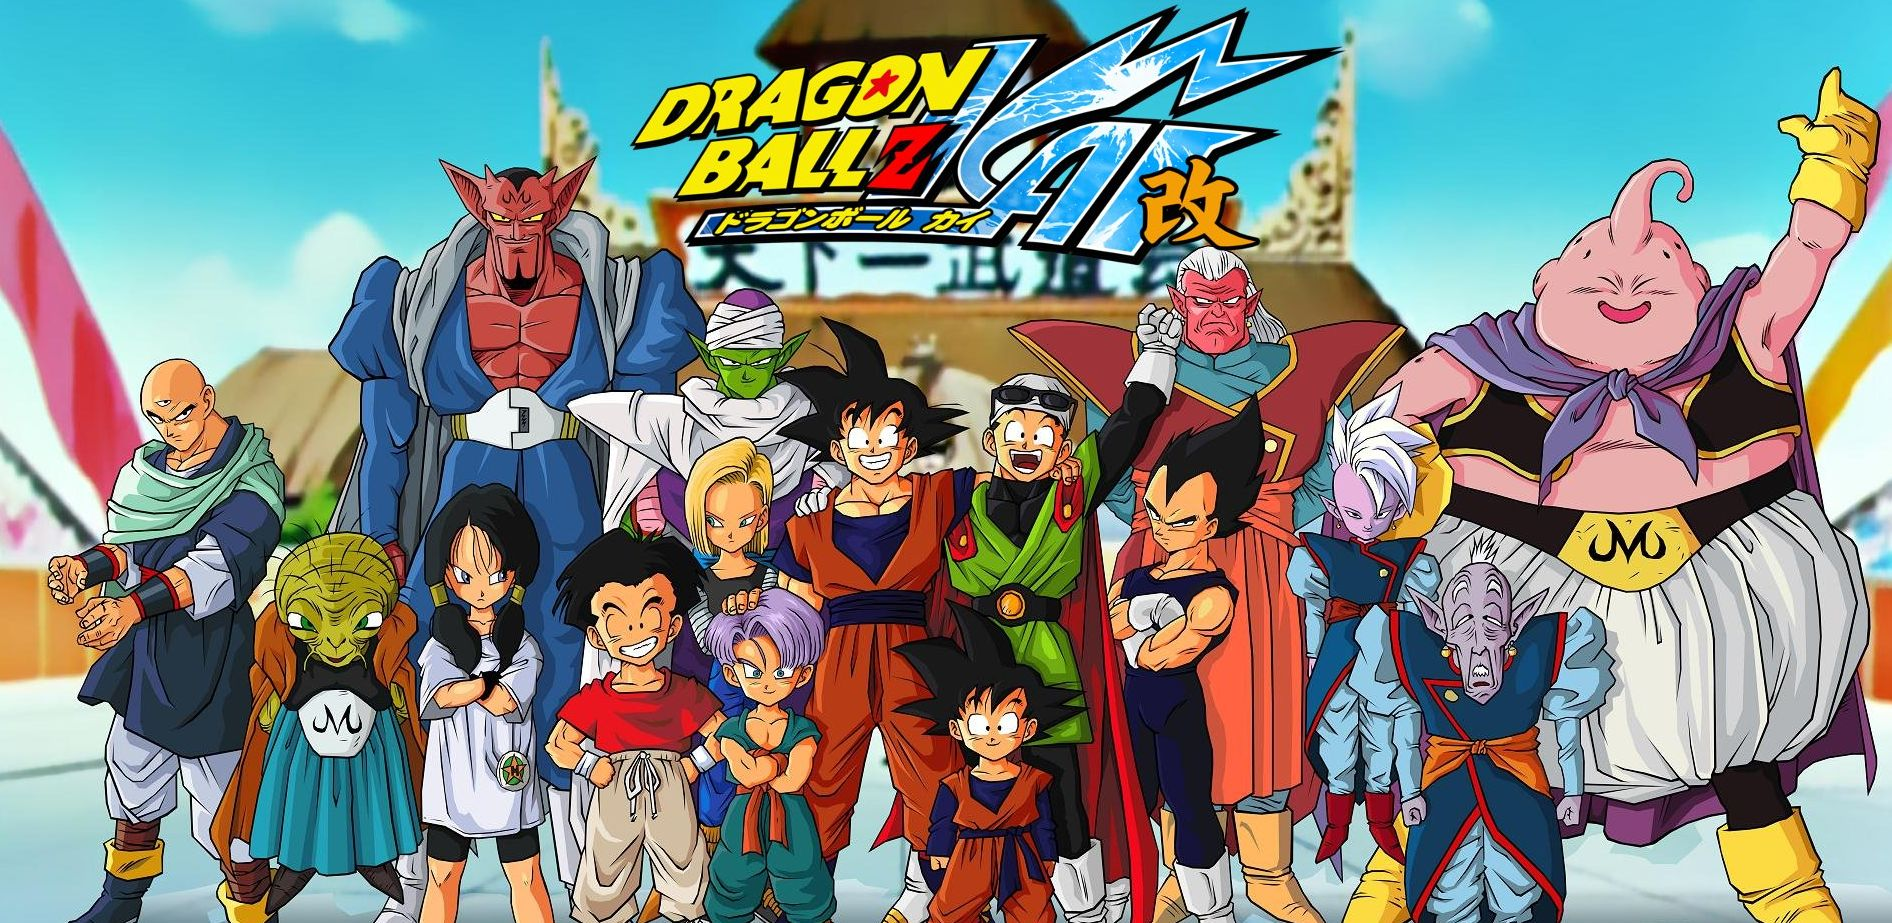 Dragon Ball Z Kai Finally Releasing The English Dub Of The Buu Saga Cultjer